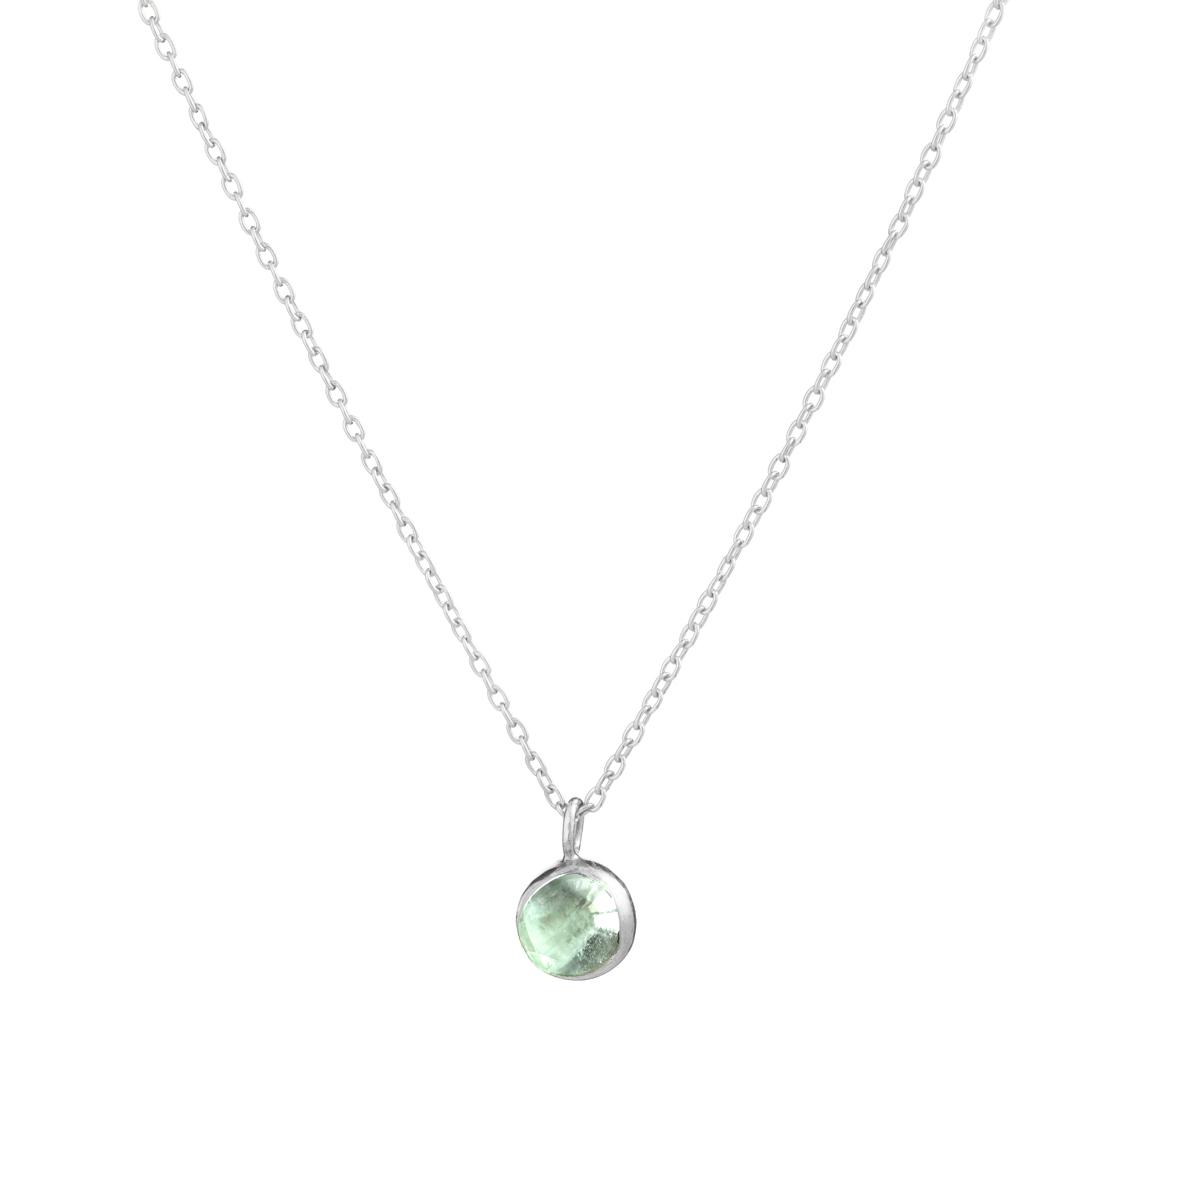 Blossom bud pendant with fluorite